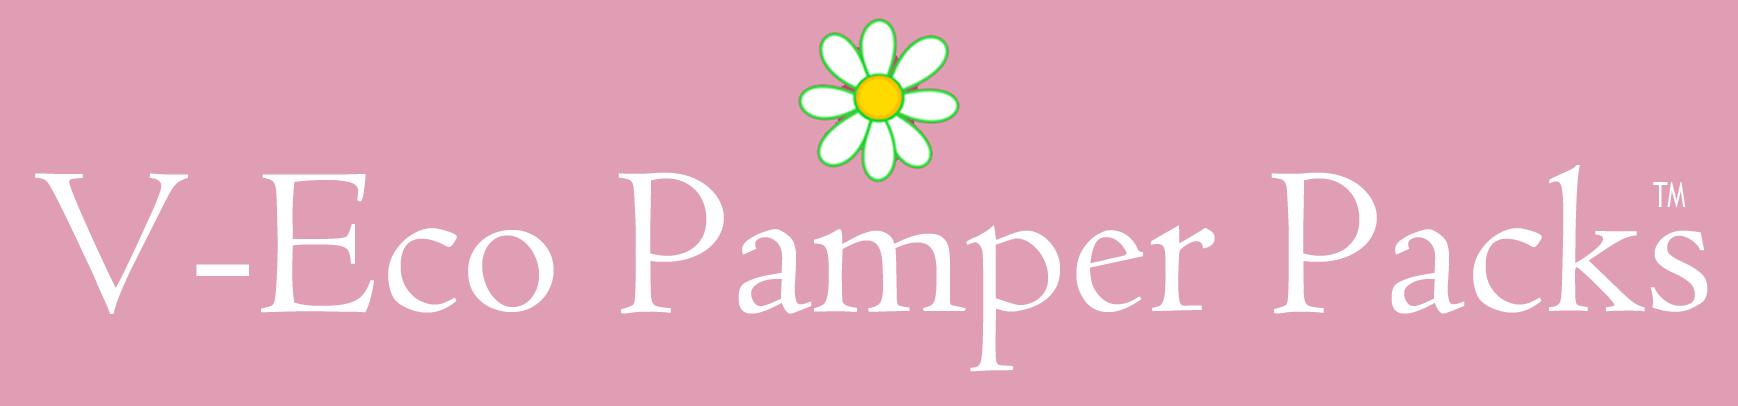 V-Eco Pamper Packs  logo